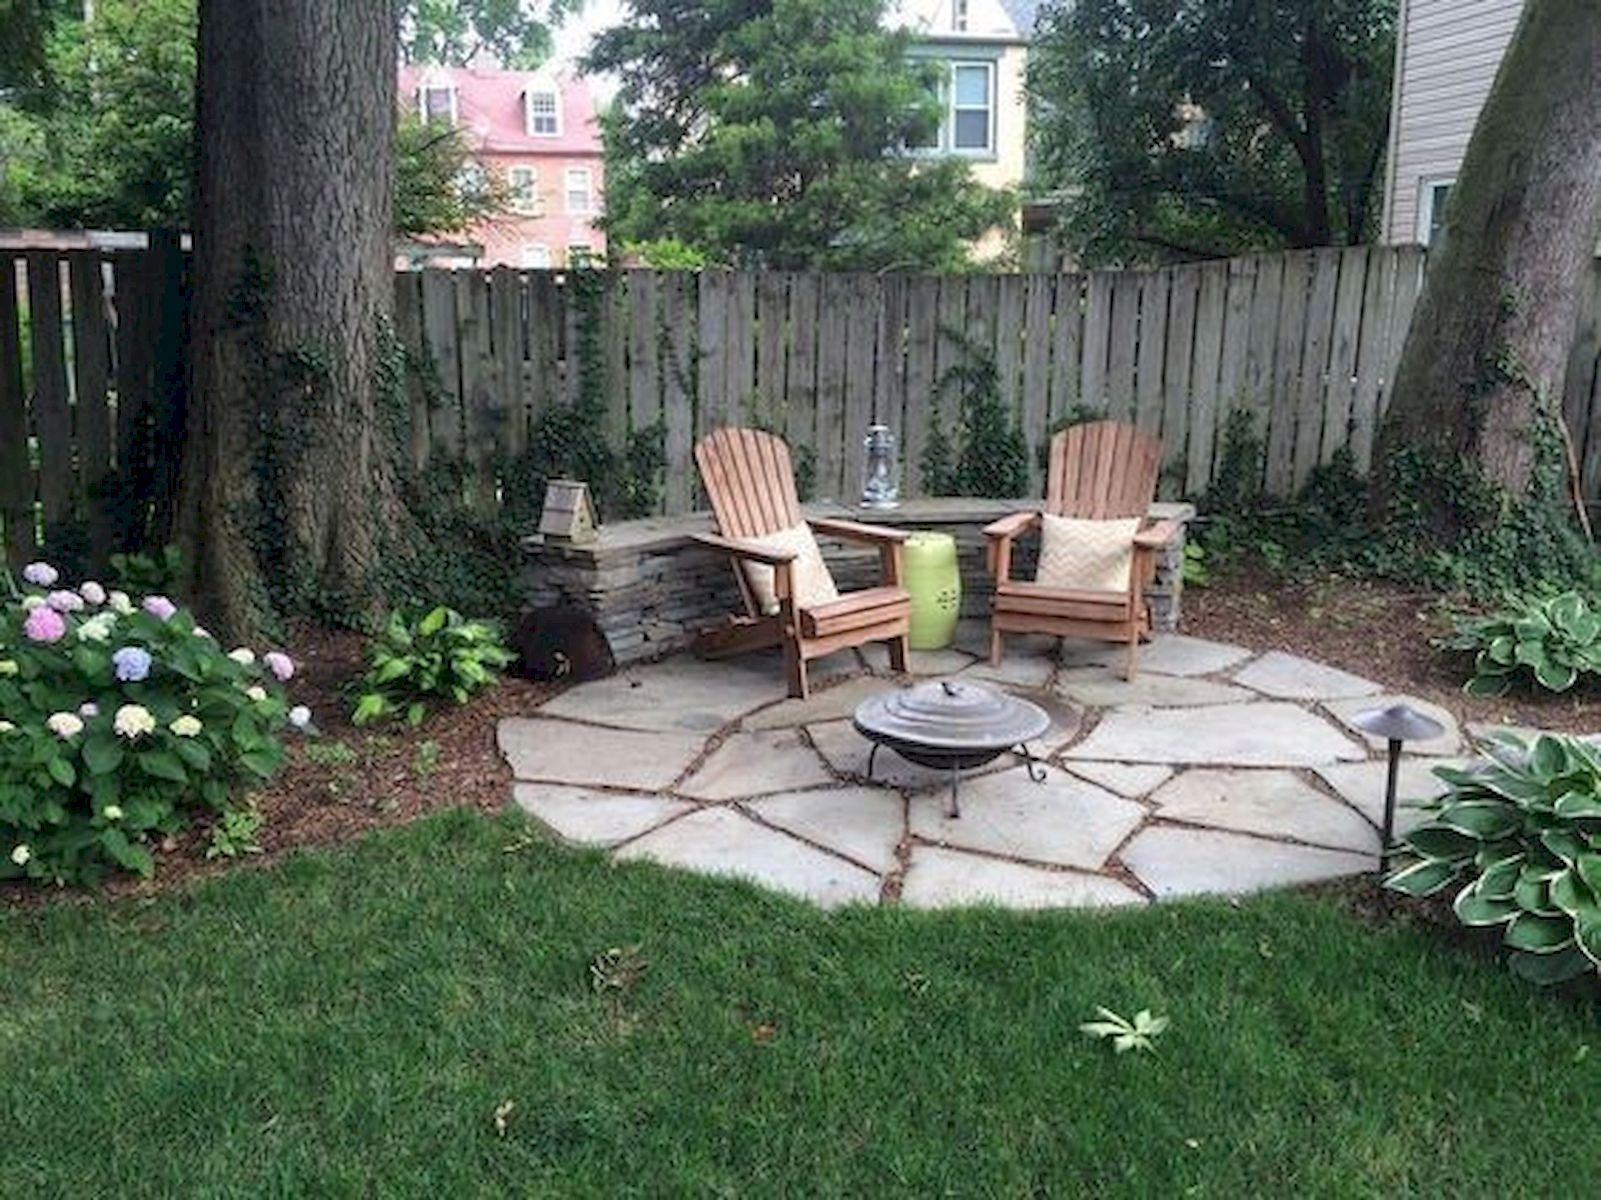 55 Beautiful Backyard Patio Ideas On A Budget | Small ... on Simple Patio Ideas On A Budget id=40734